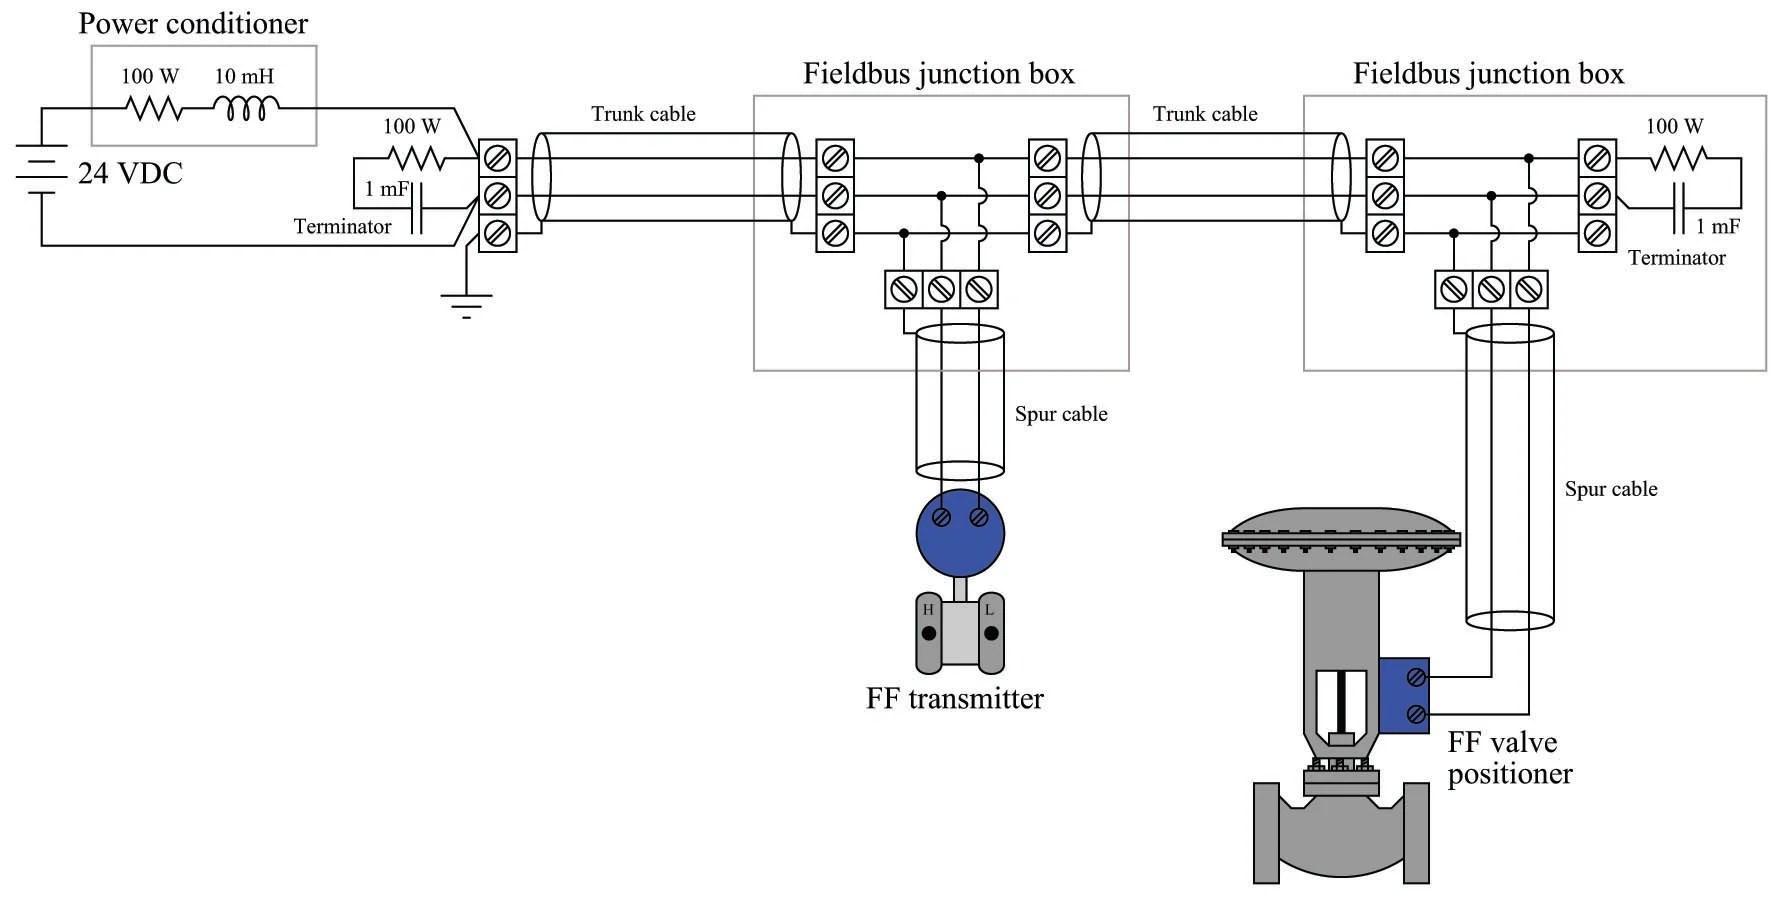 Wiring Diagram Power Conditioner